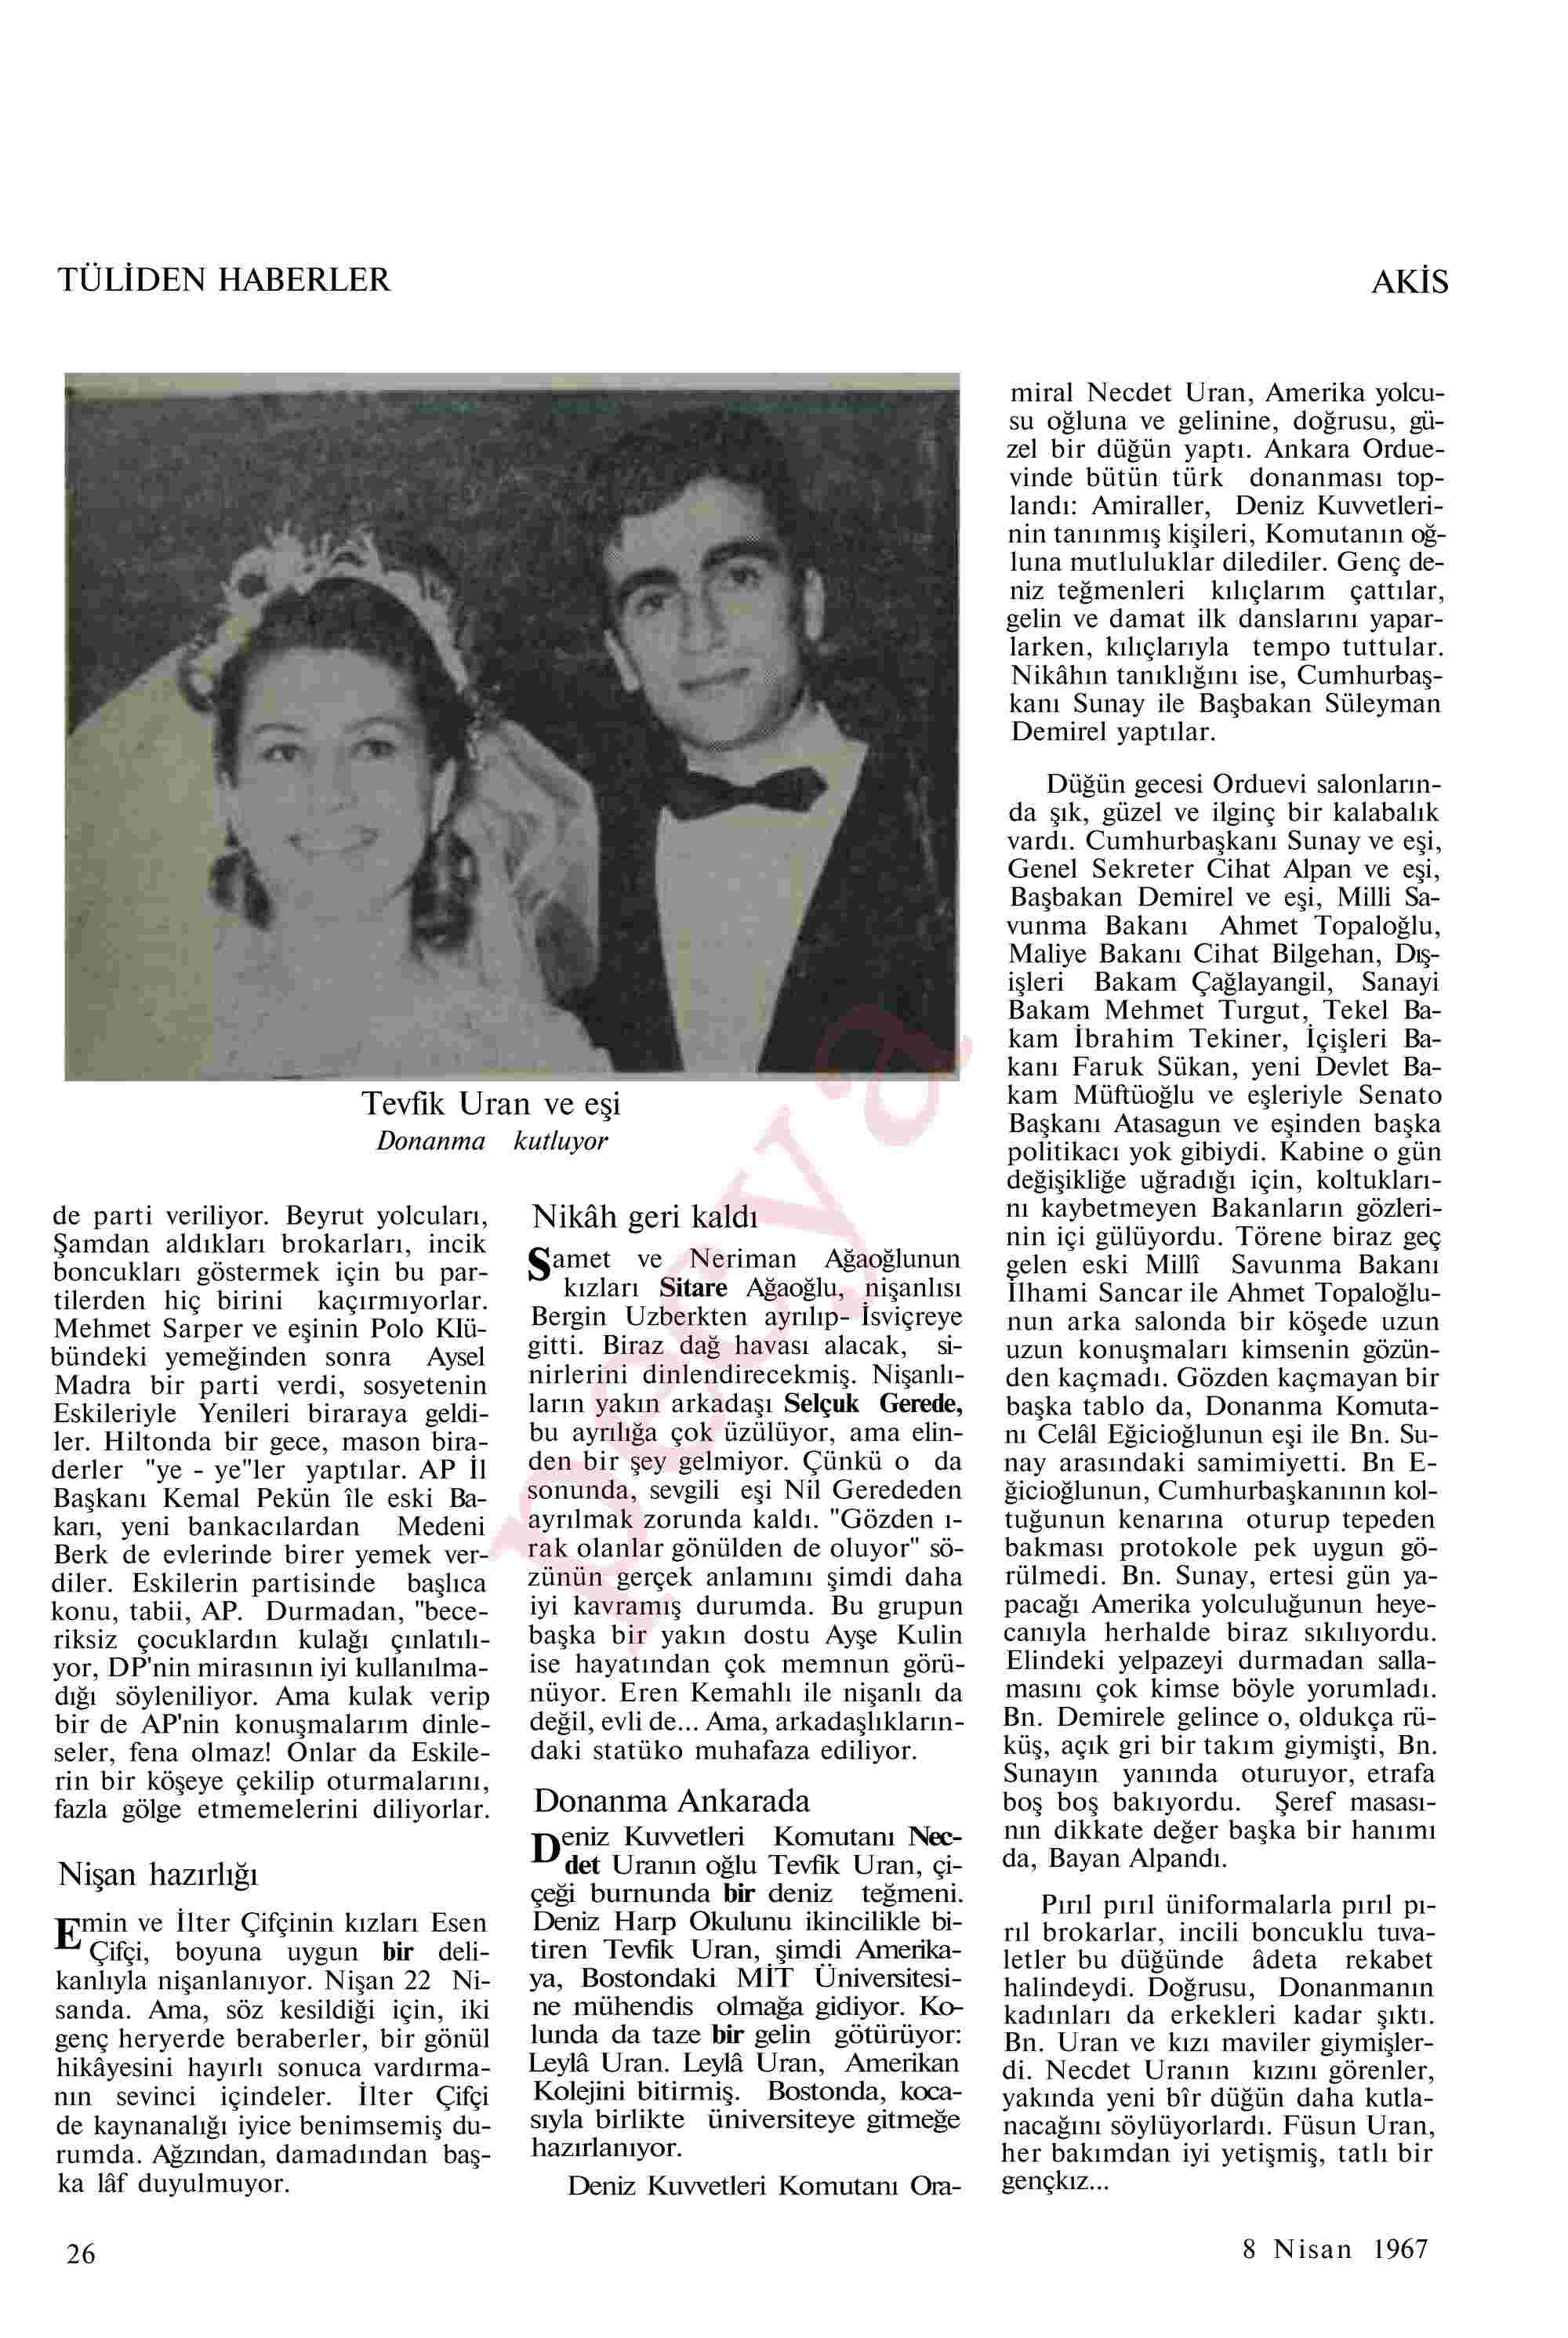 8 Nisan 1967 Tarihli Akis Dergisi Sayfa 26